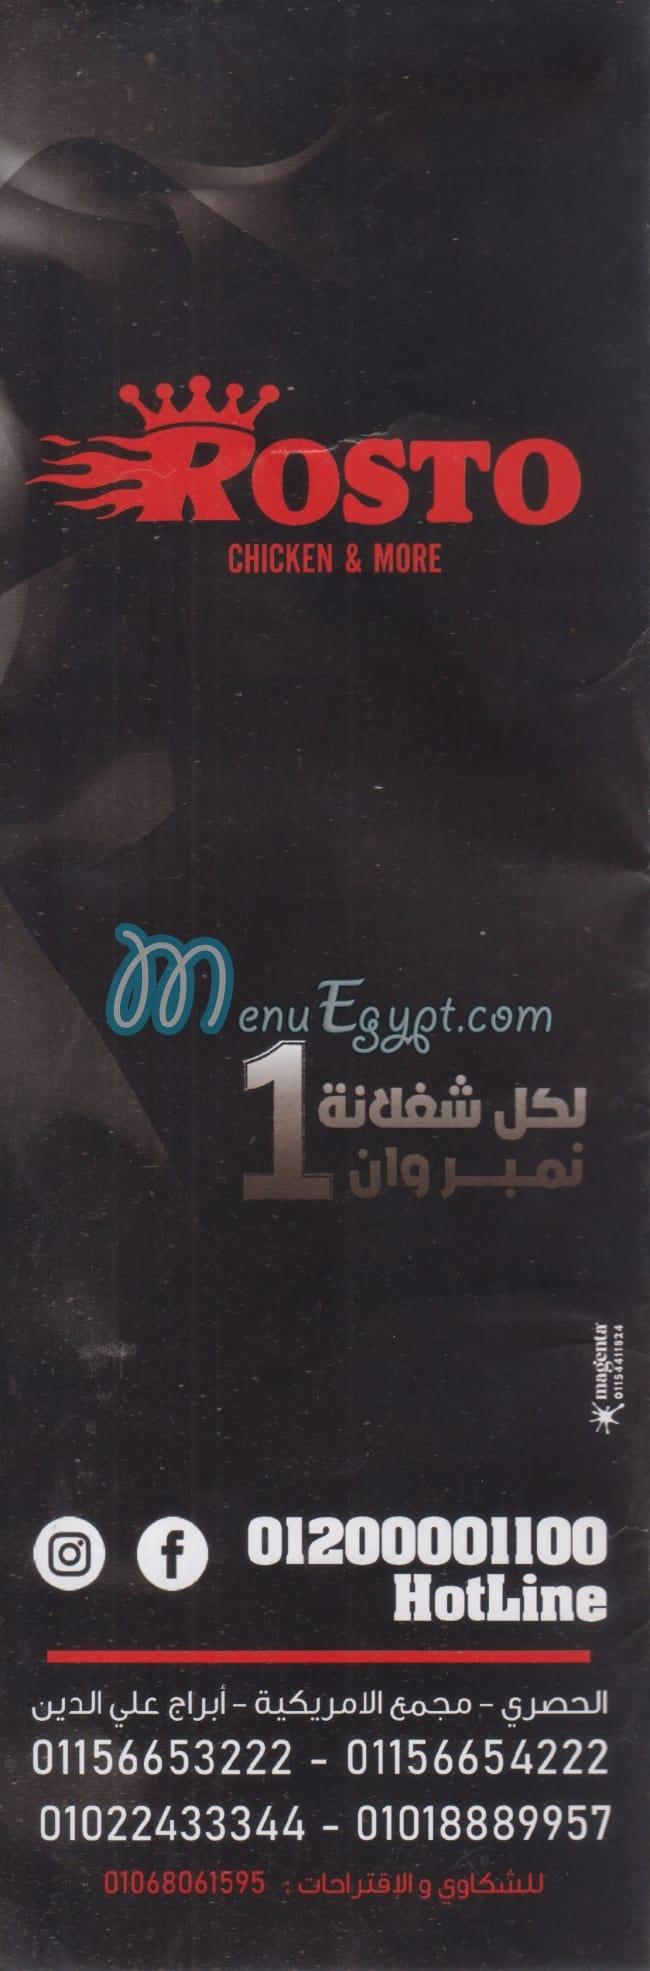 Rosto El Sheikh Zayed menu